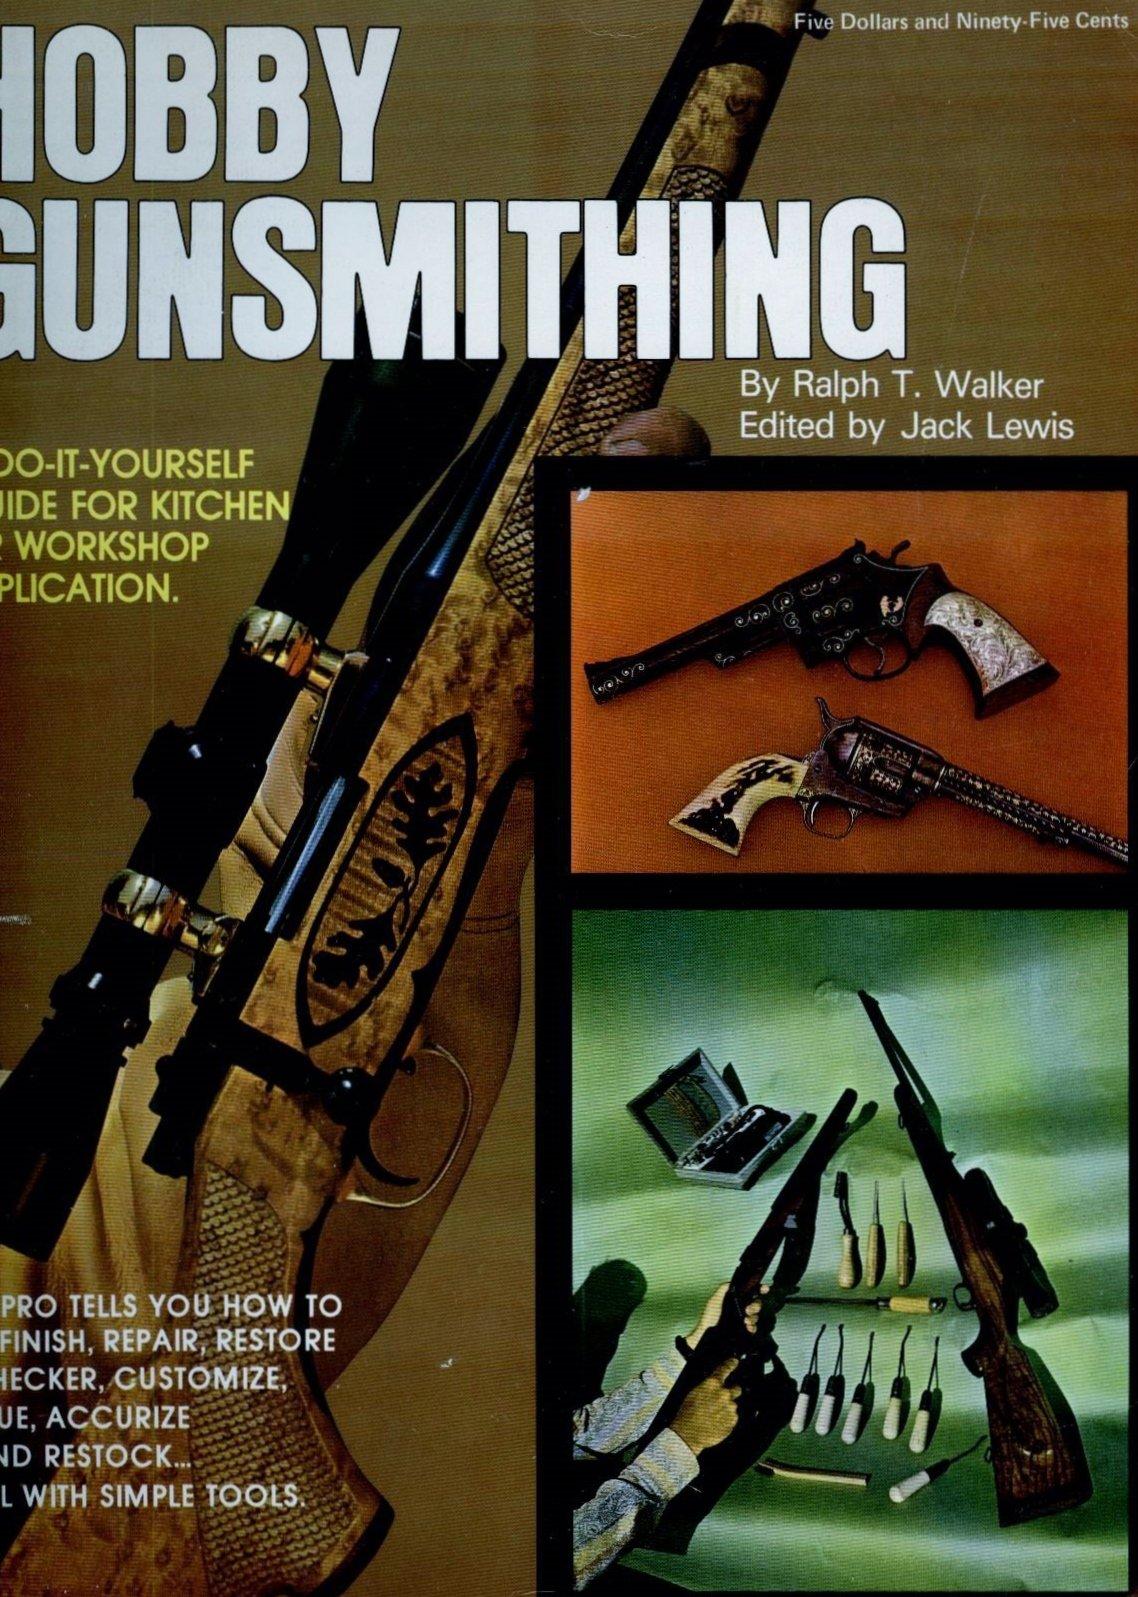 Hobby Gunsmithing: Ralph T. Walker, Jack Lewis: 9780695803612: Amazon.com:  Books